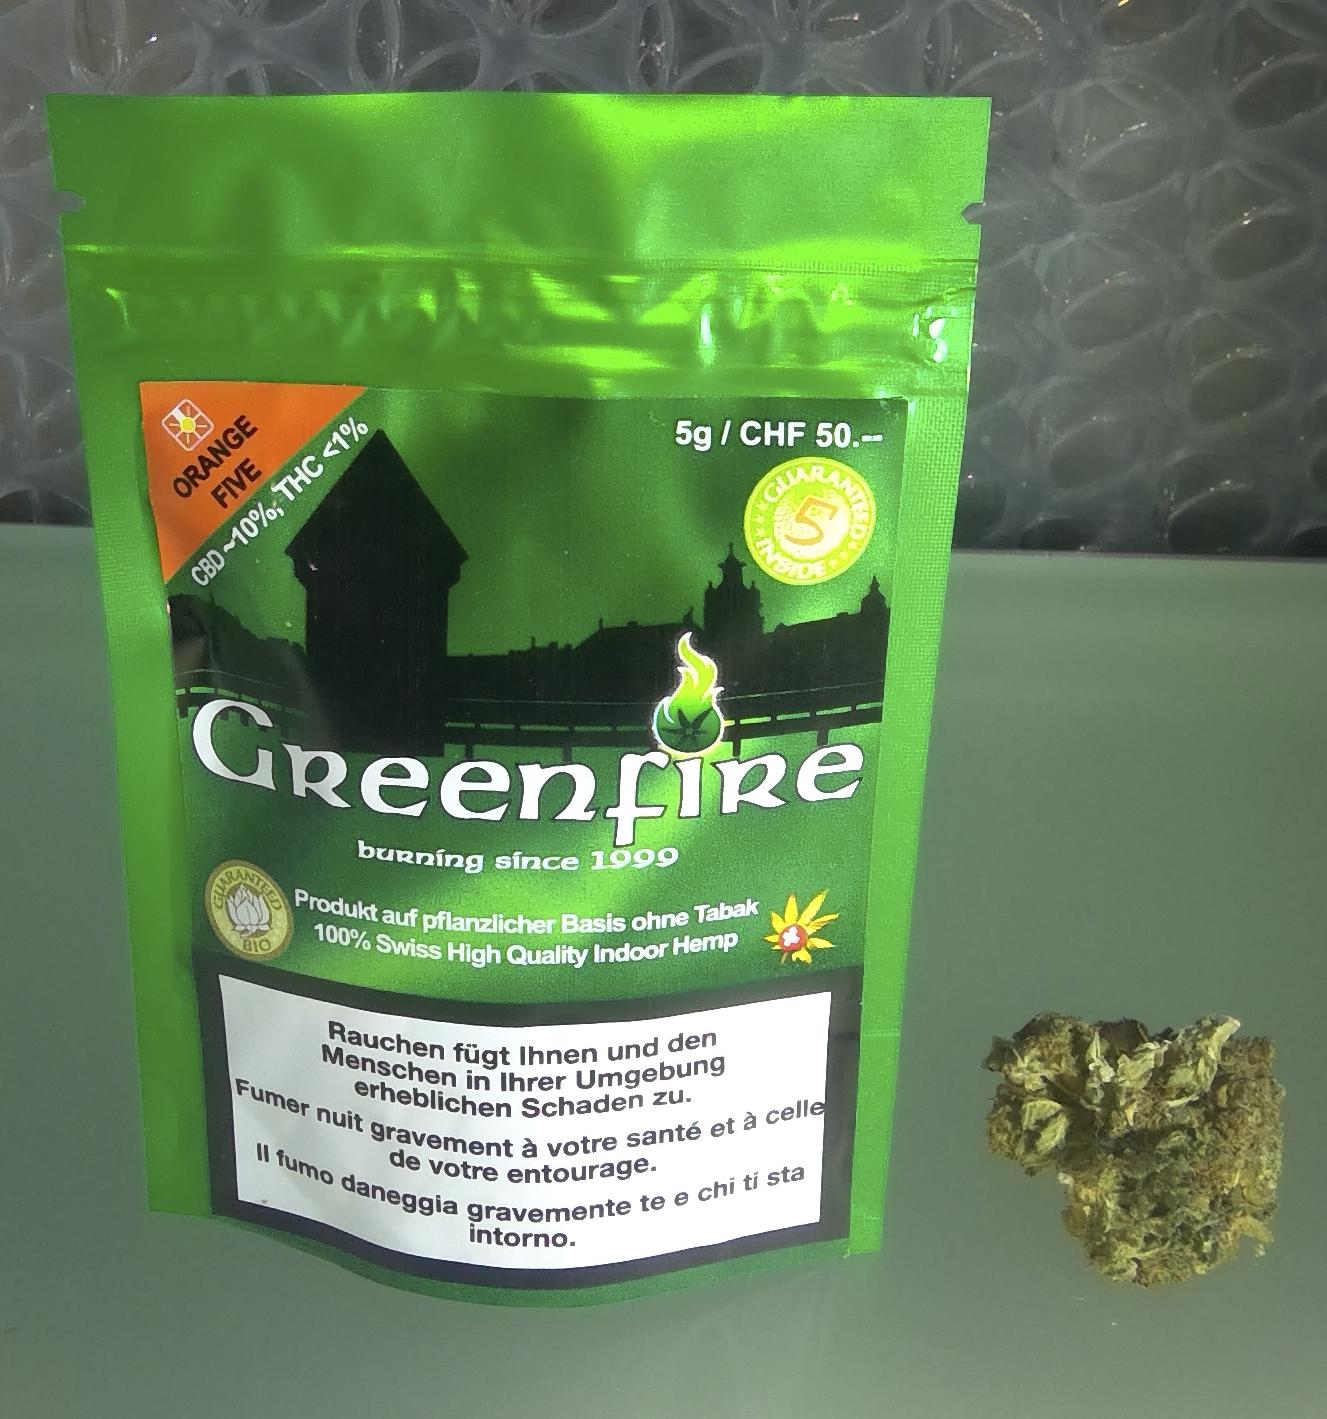 Unsere Hausmarke Greenfire Orange Five